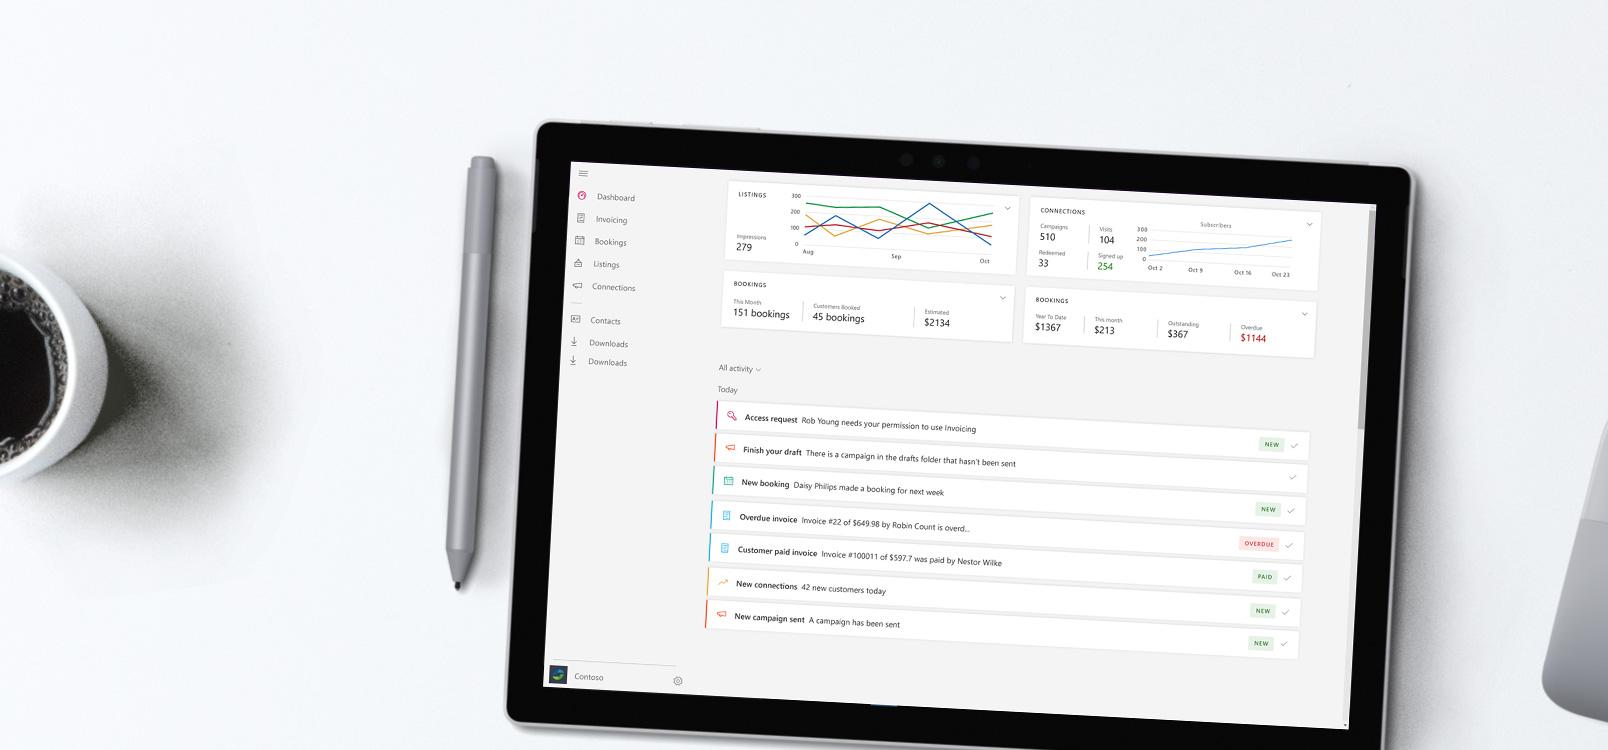 Prenosný počítač so zobrazením lokality Office 365 Business Center